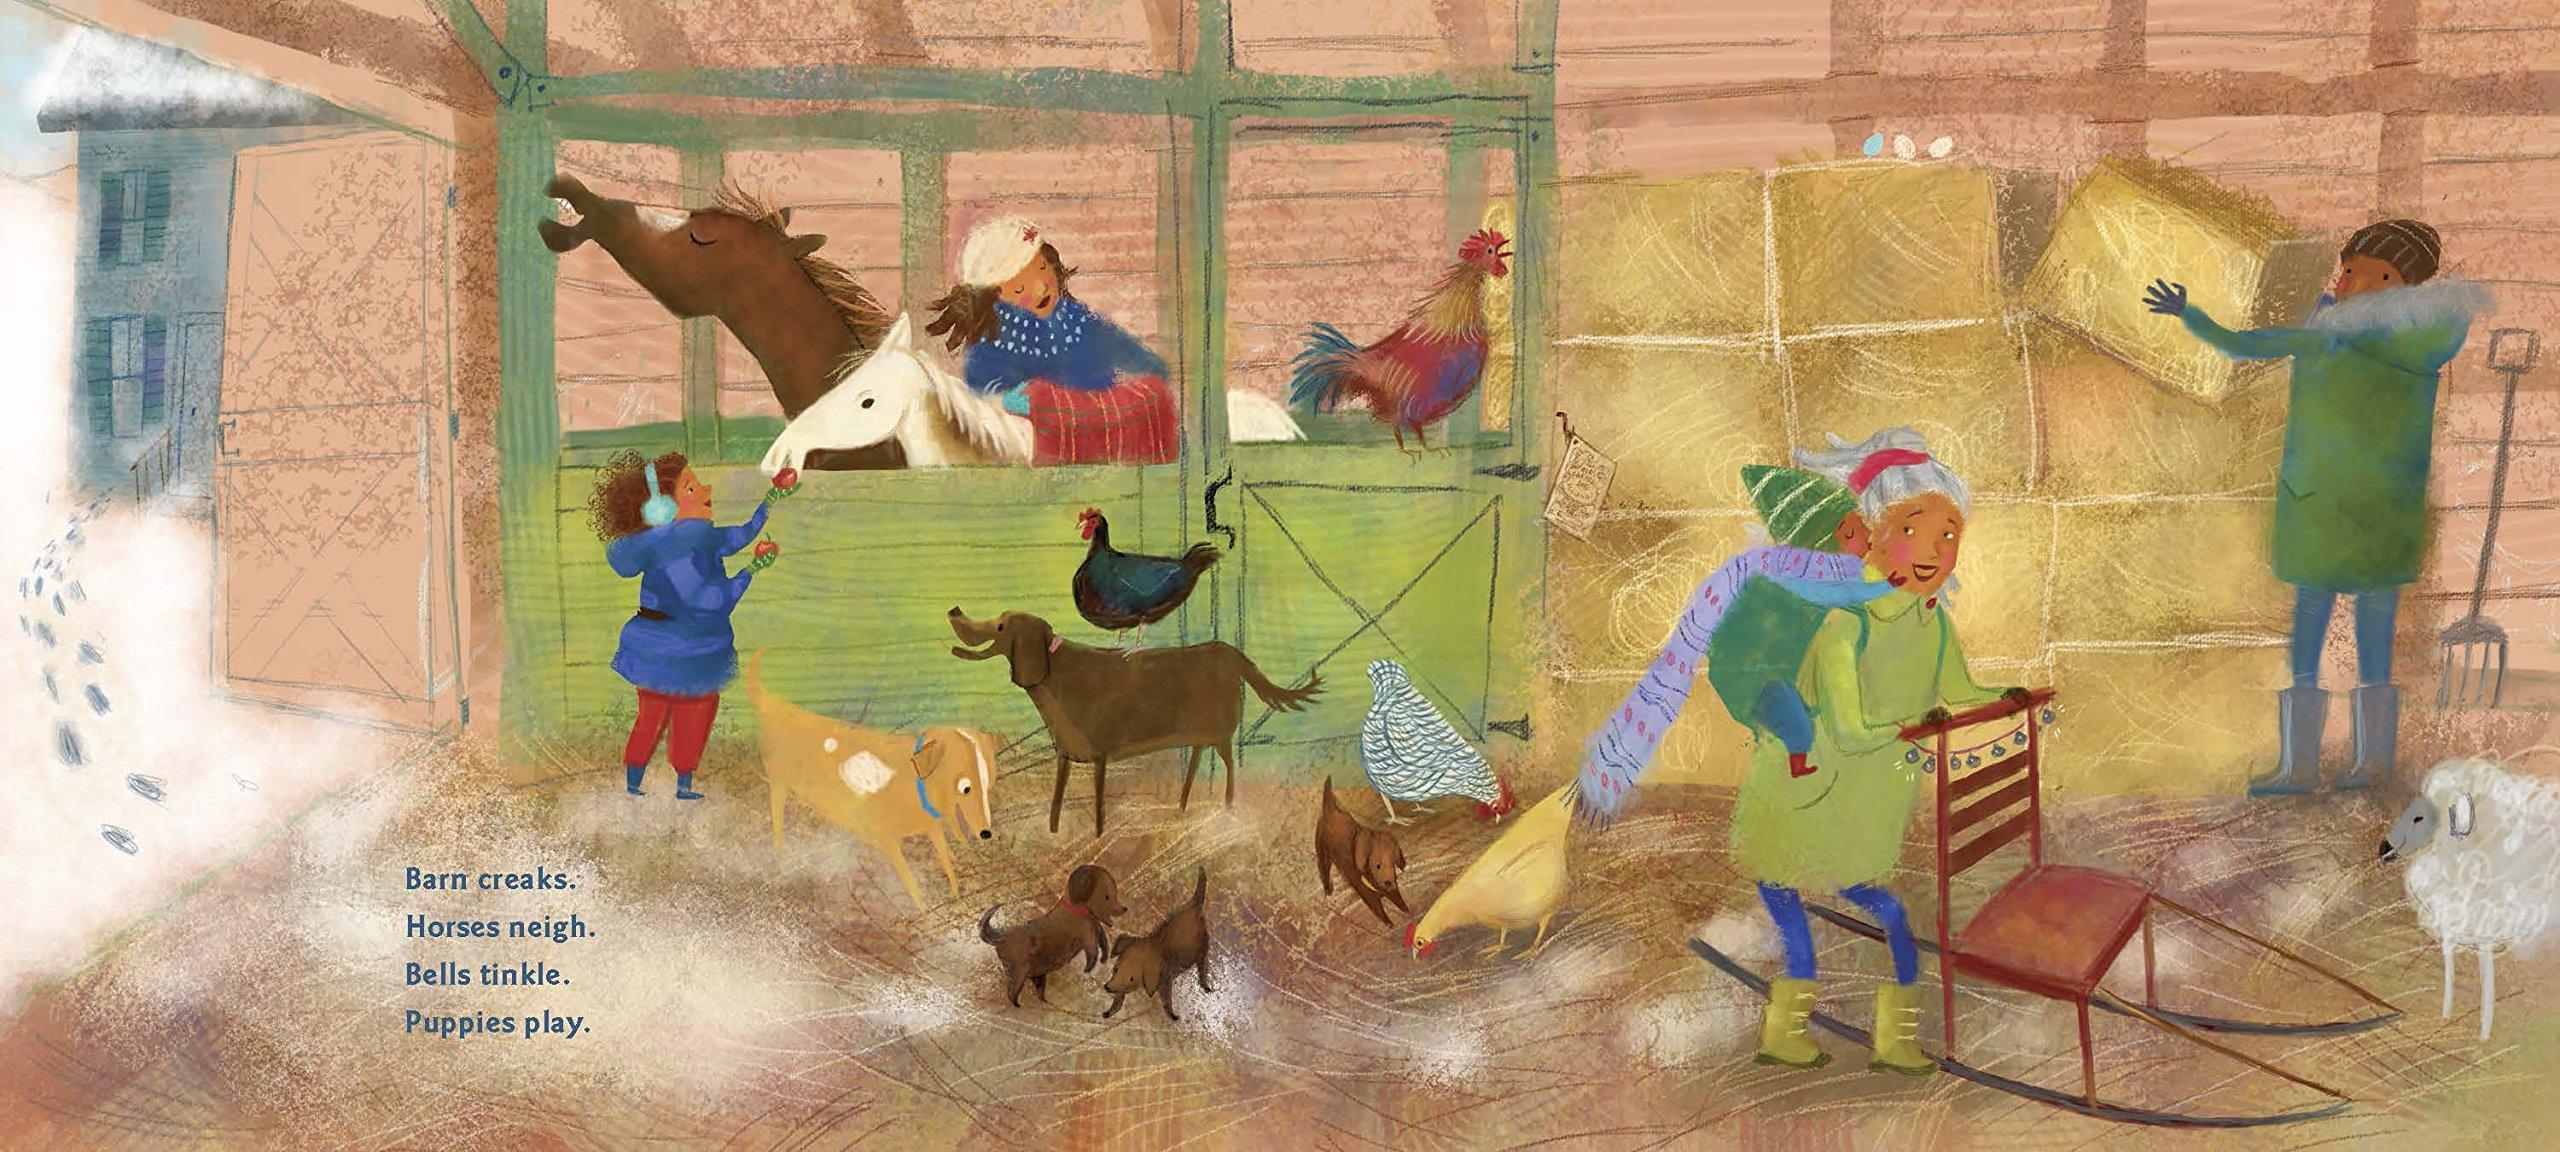 celebrate-picture-books-picture-book-review-when-the-snow-falls-barn